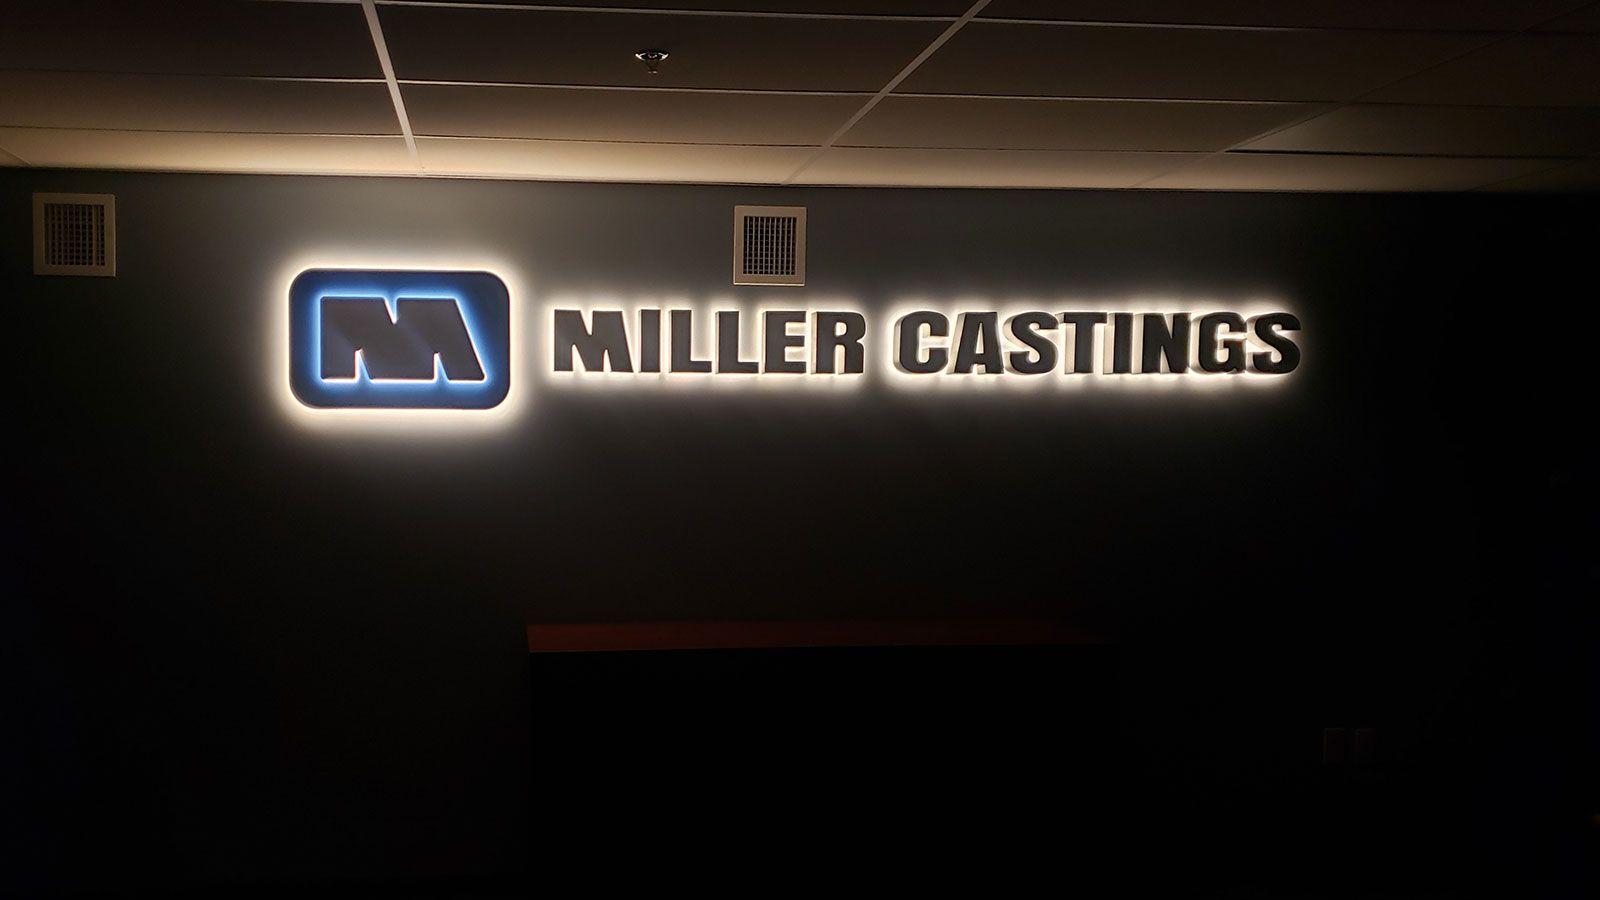 Miller castings reverse channel letters